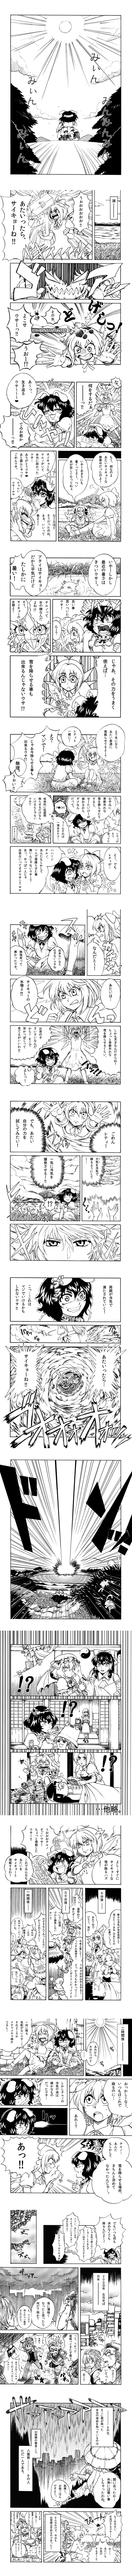 reisen udongein inaba, houraisan kaguya, hoshiguma yuugi, remilia scarlet, yagokoro eirin, and etc (touhou) drawn by oonamazu